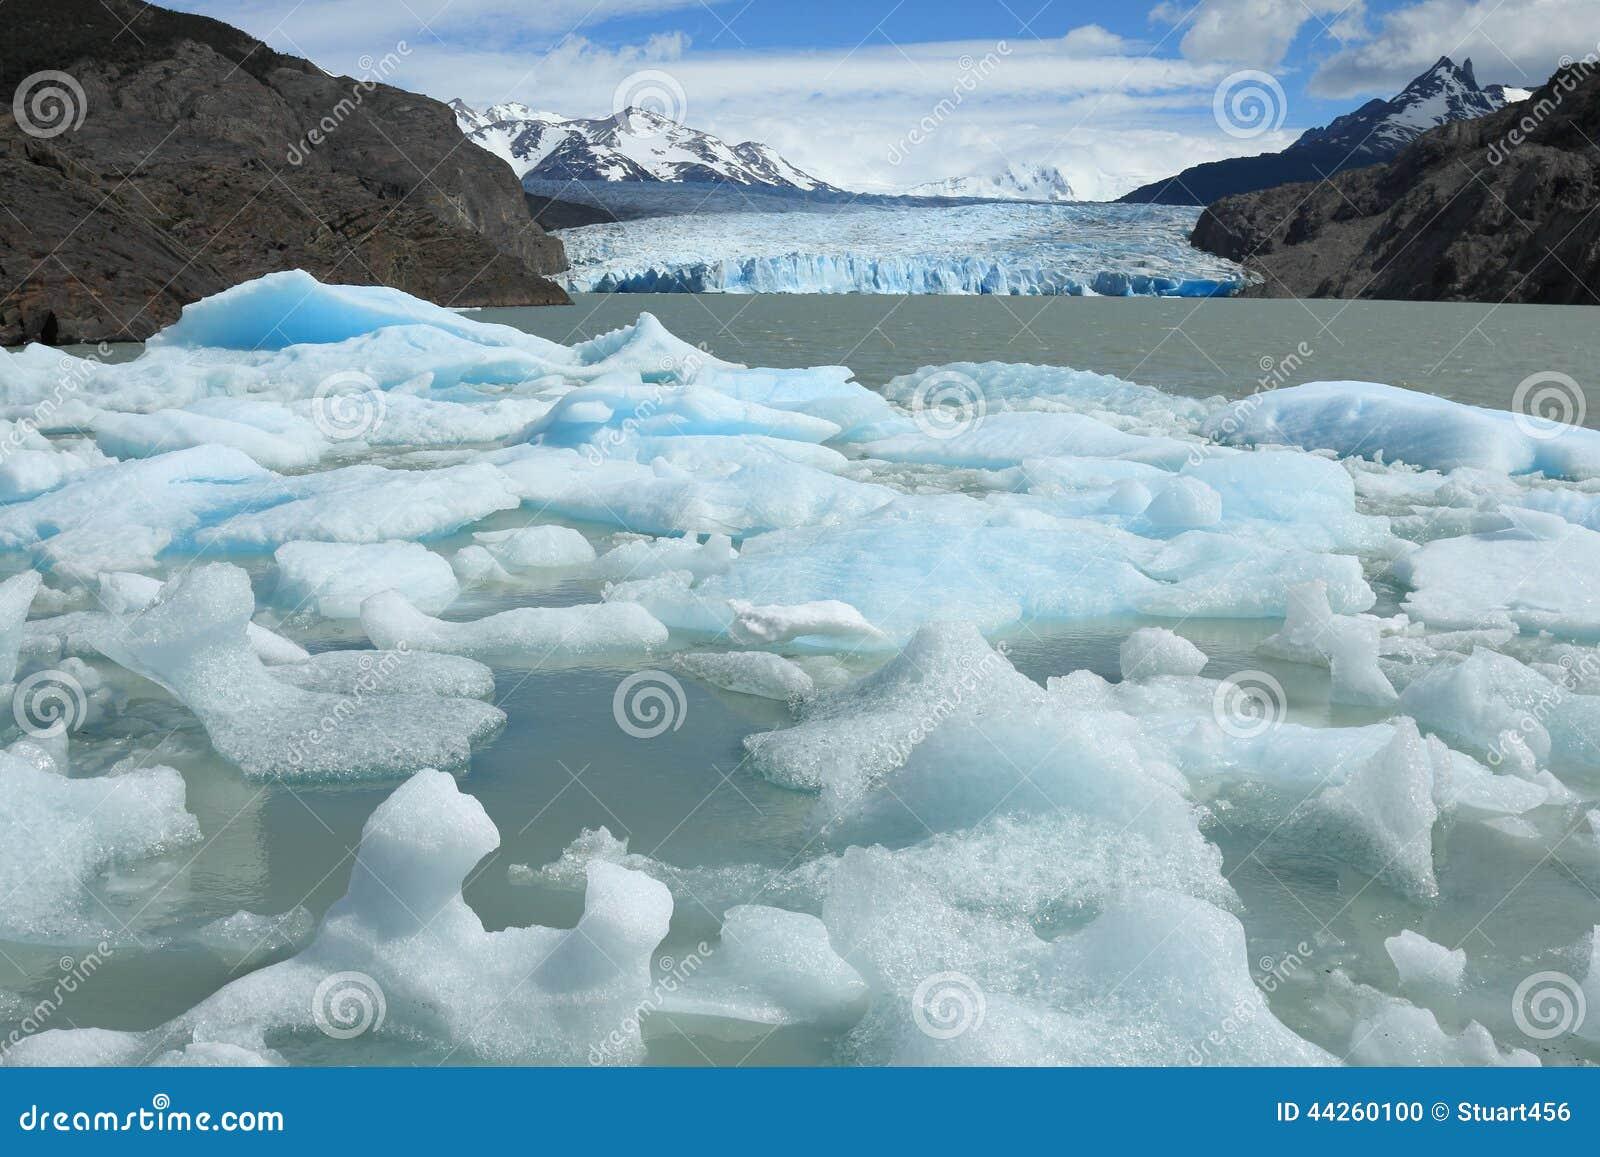 Blue Glacier Management Group 99